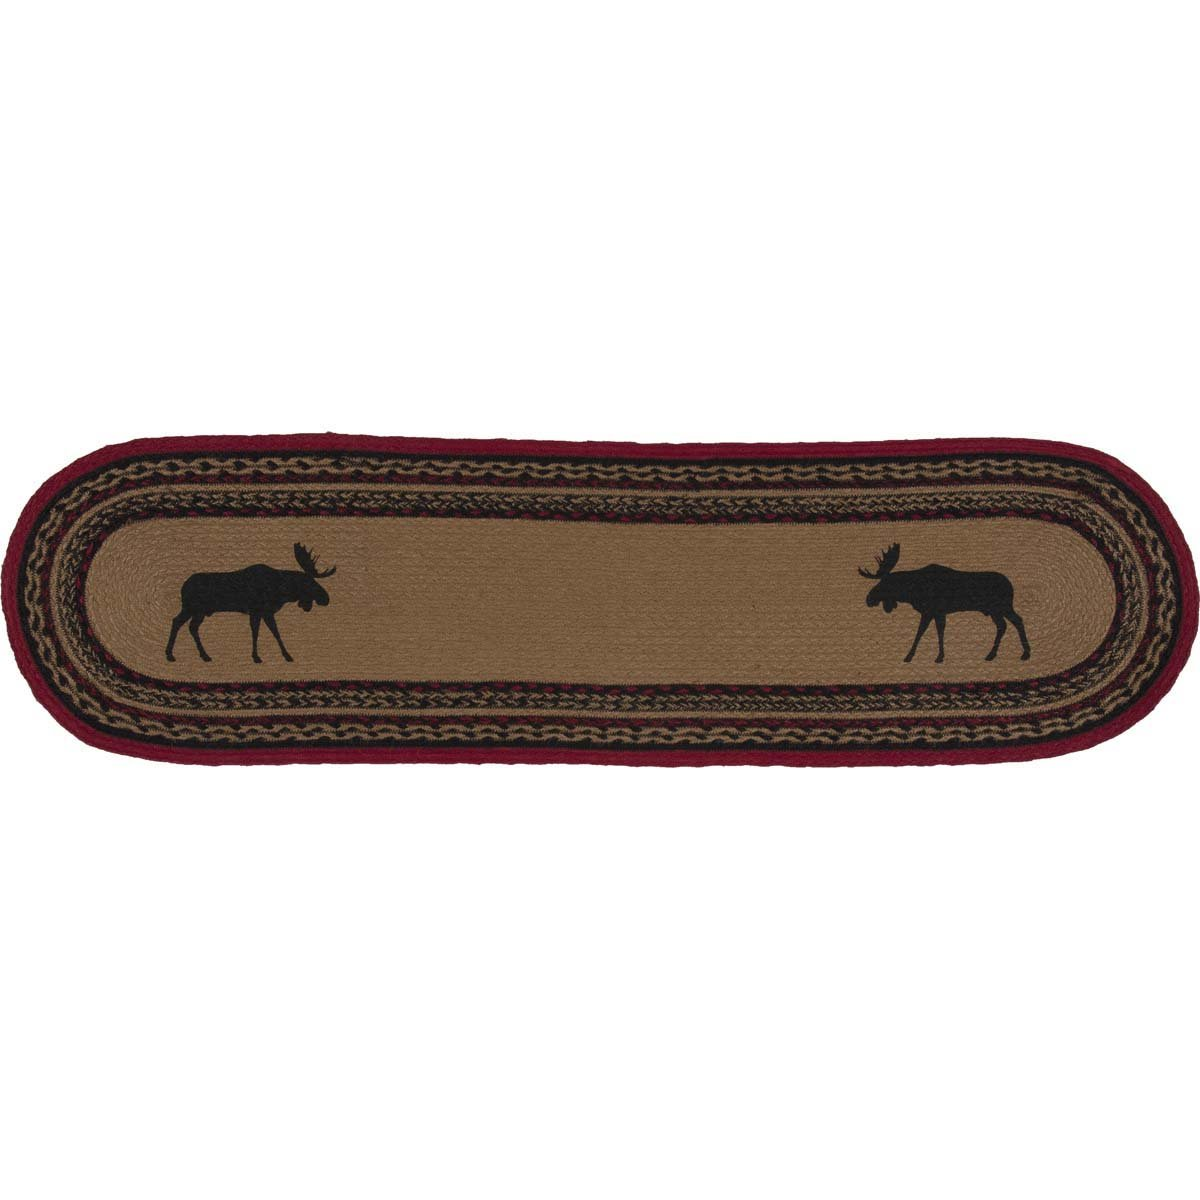 VHC Brands 37870 Rustic & Lodge Tabletop & Kitchen - Cumberland Tan Oval Jute Runner 13x48 Almond